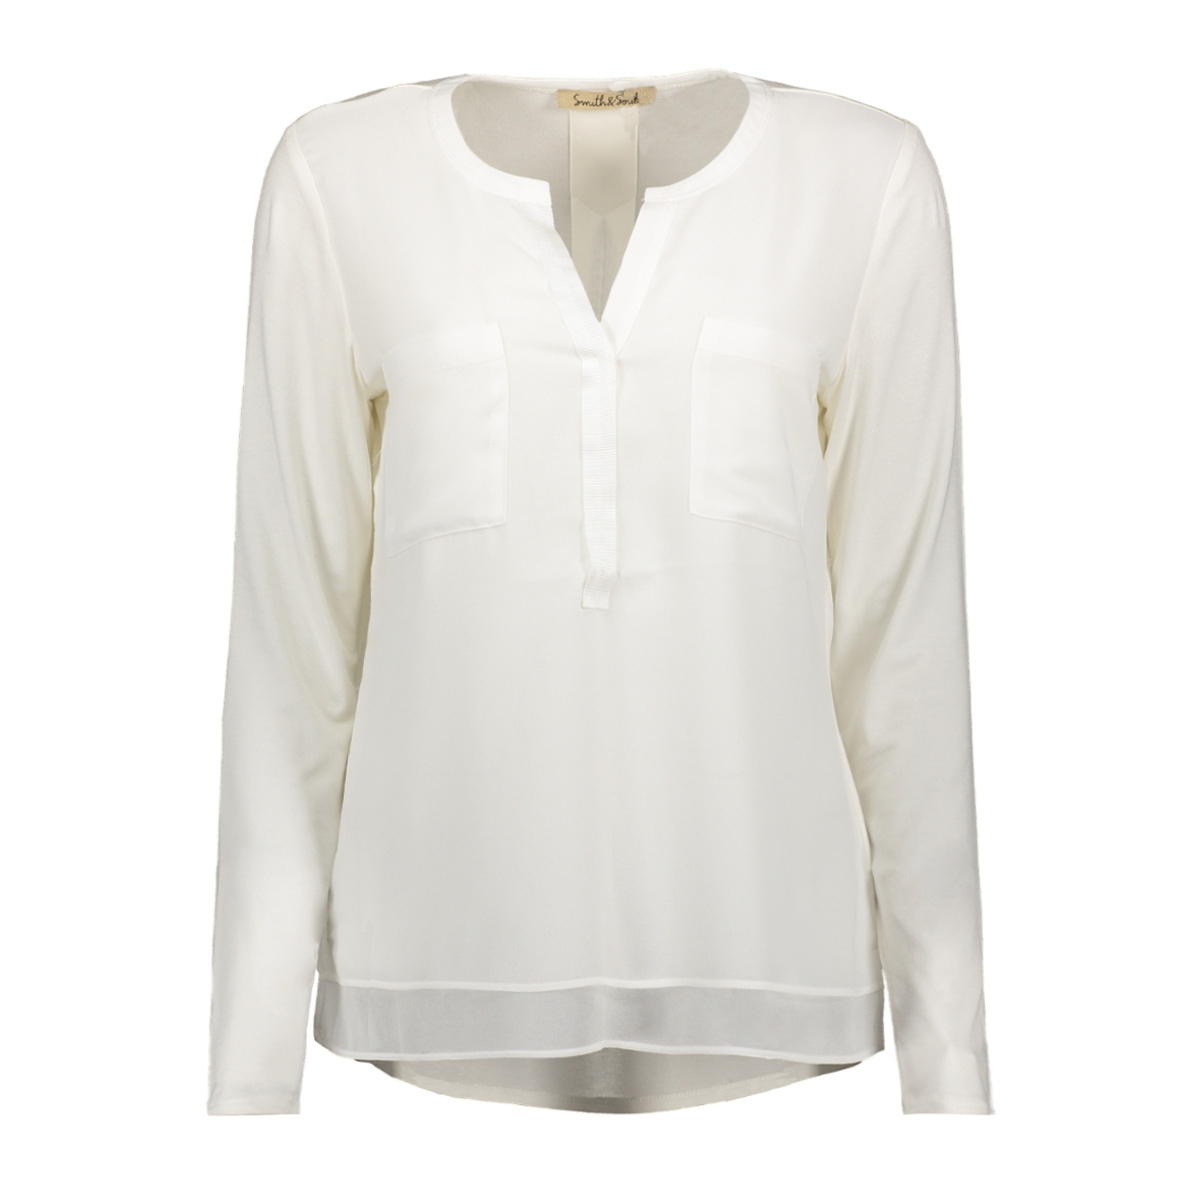 blouseshirt 0319 0900 smith & soul blouse off white